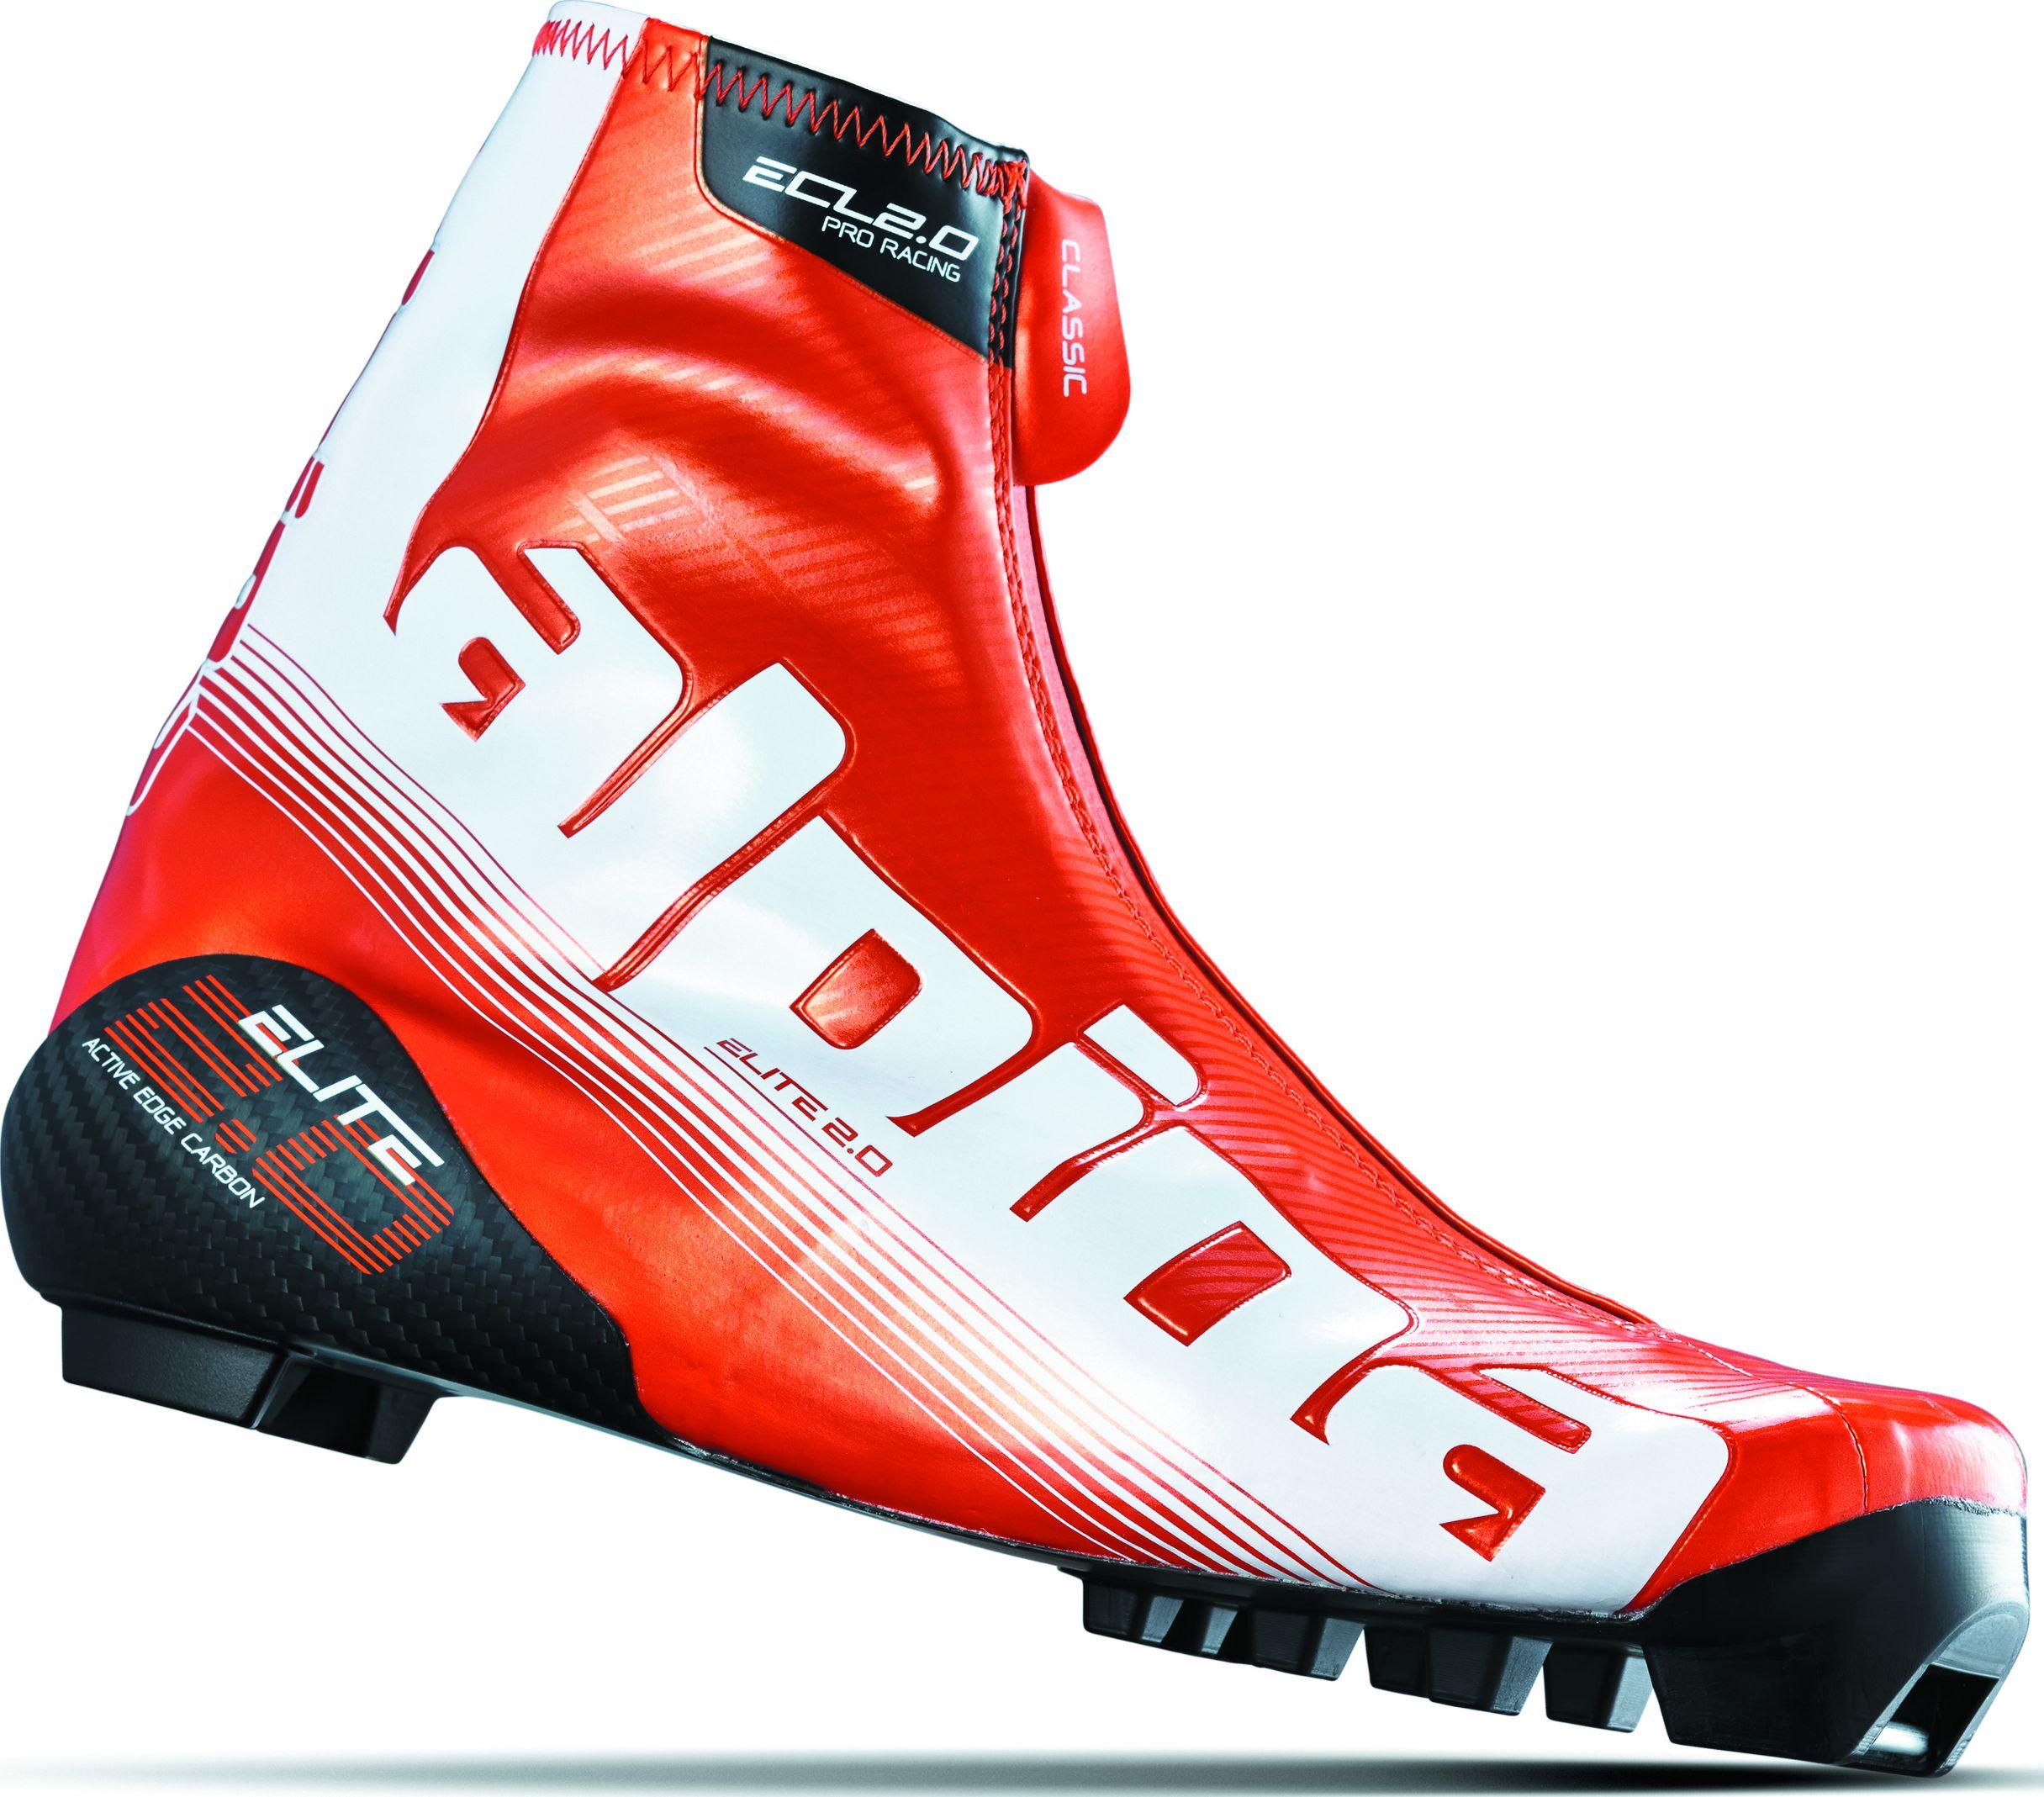 6d058fc2d87e лыжные ботинки. ALPINA ECL 2.0 5145-1